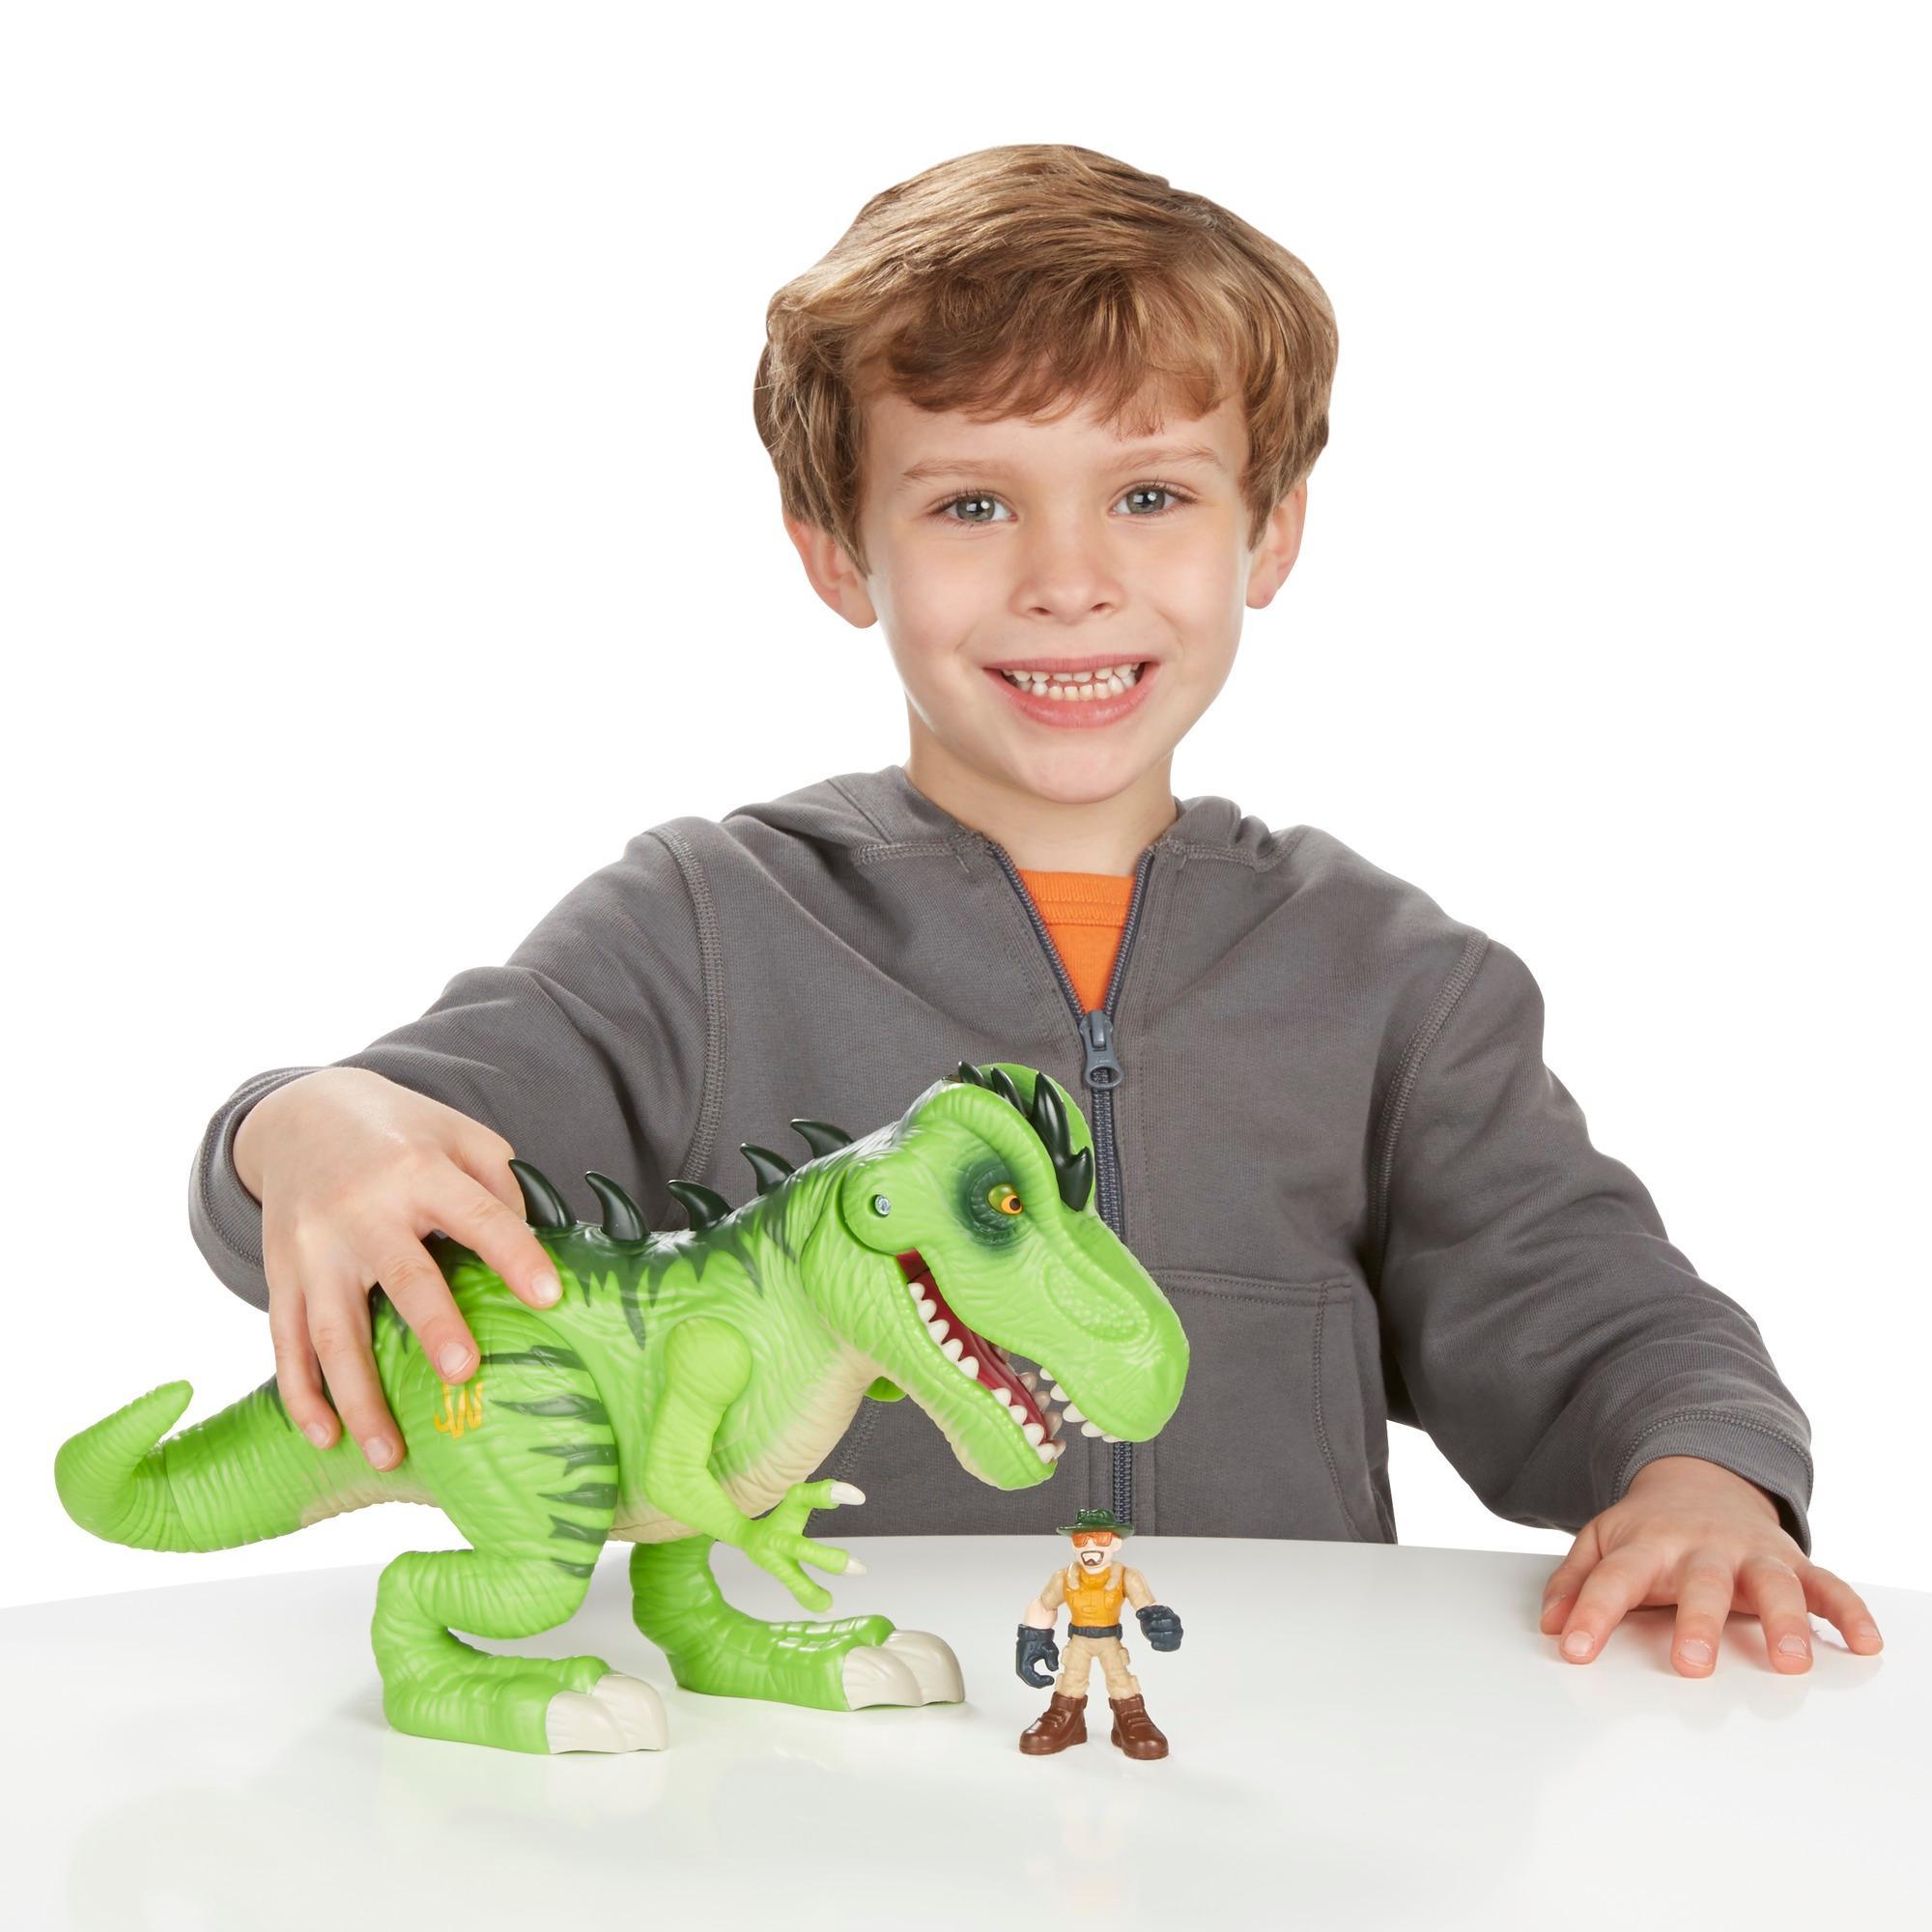 Unboxing 10 Juric World Dinosaurs Playskool Heroes Park